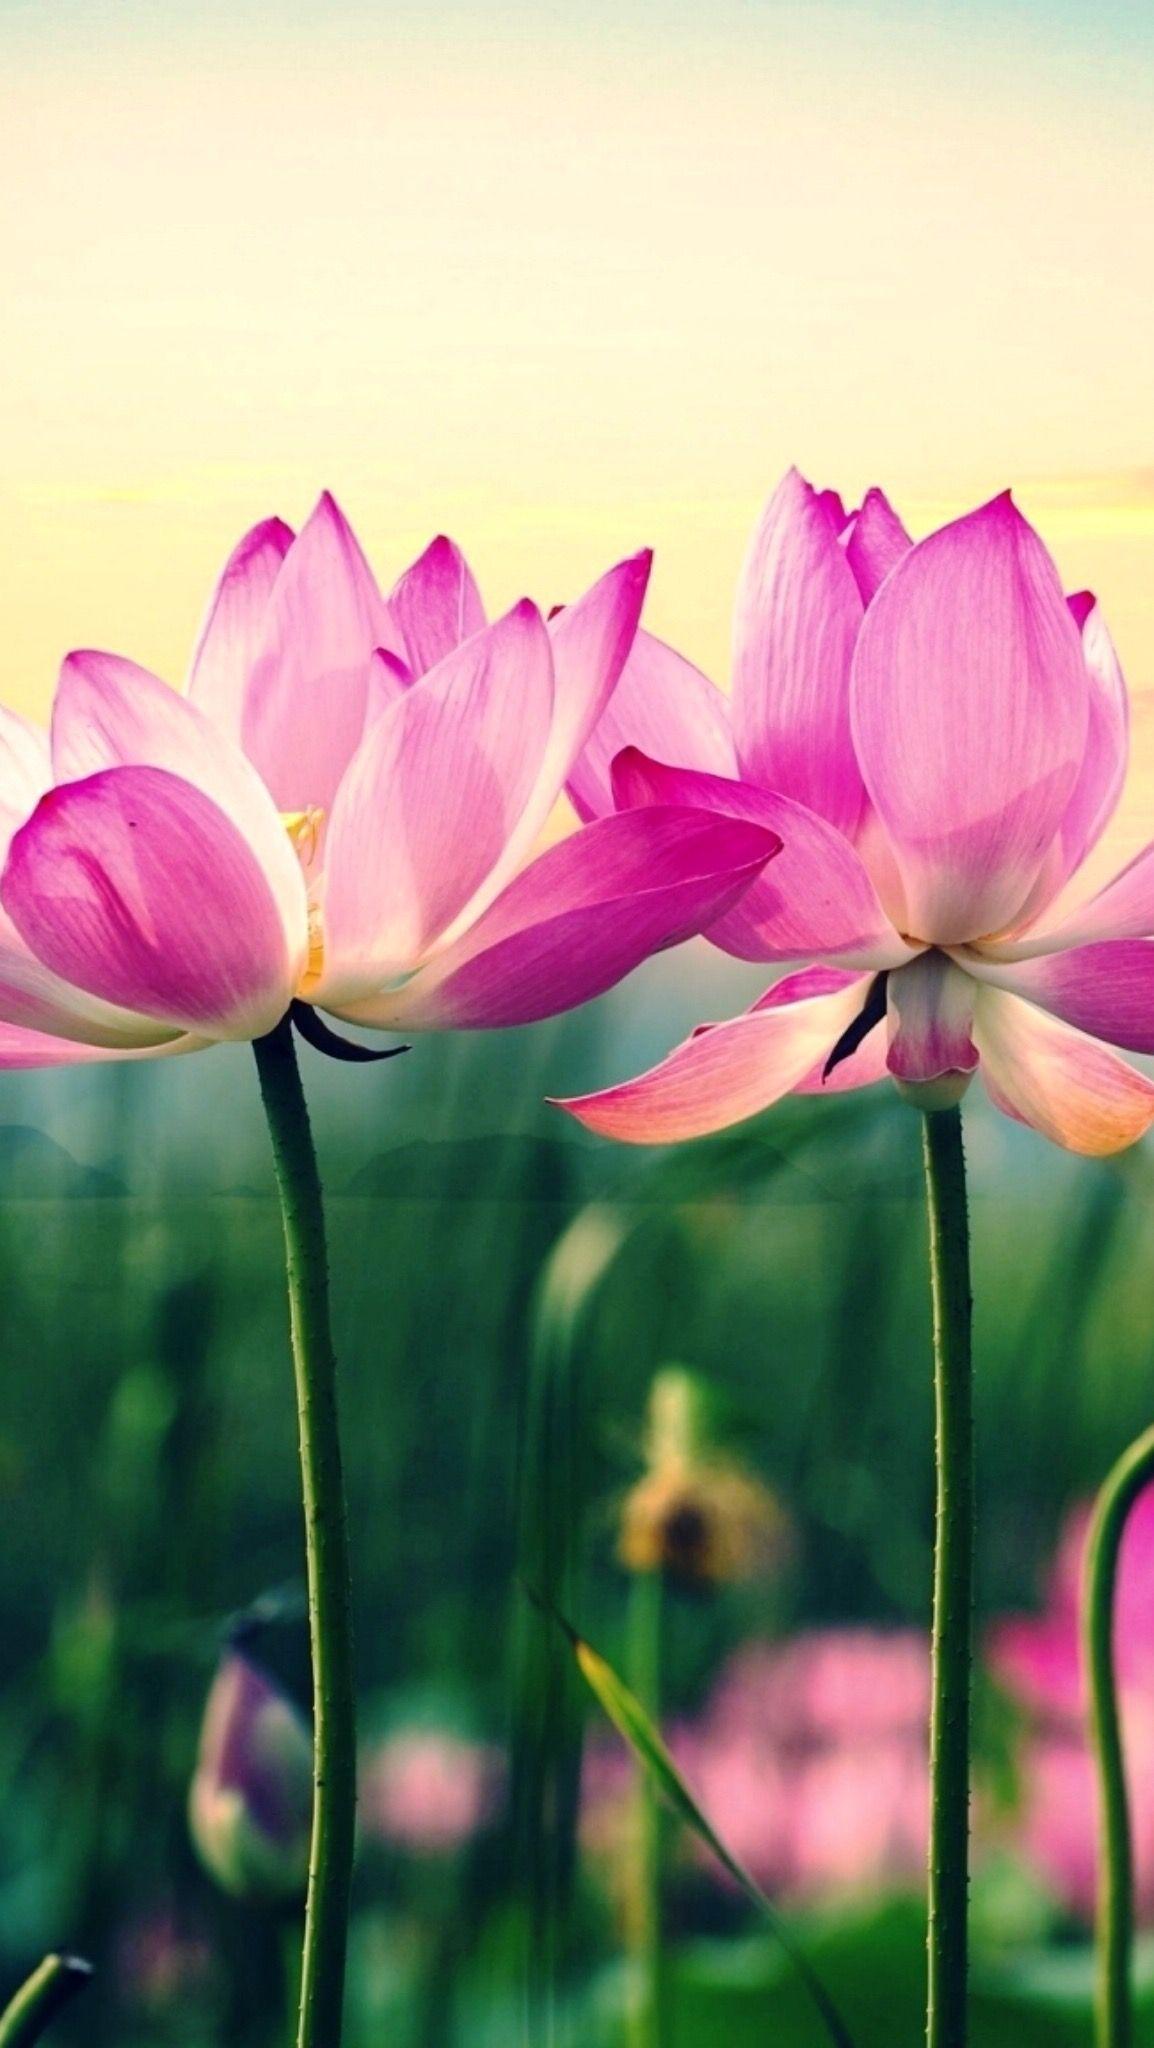 Lotus flower wallpaper, Wallpaper, Flowers